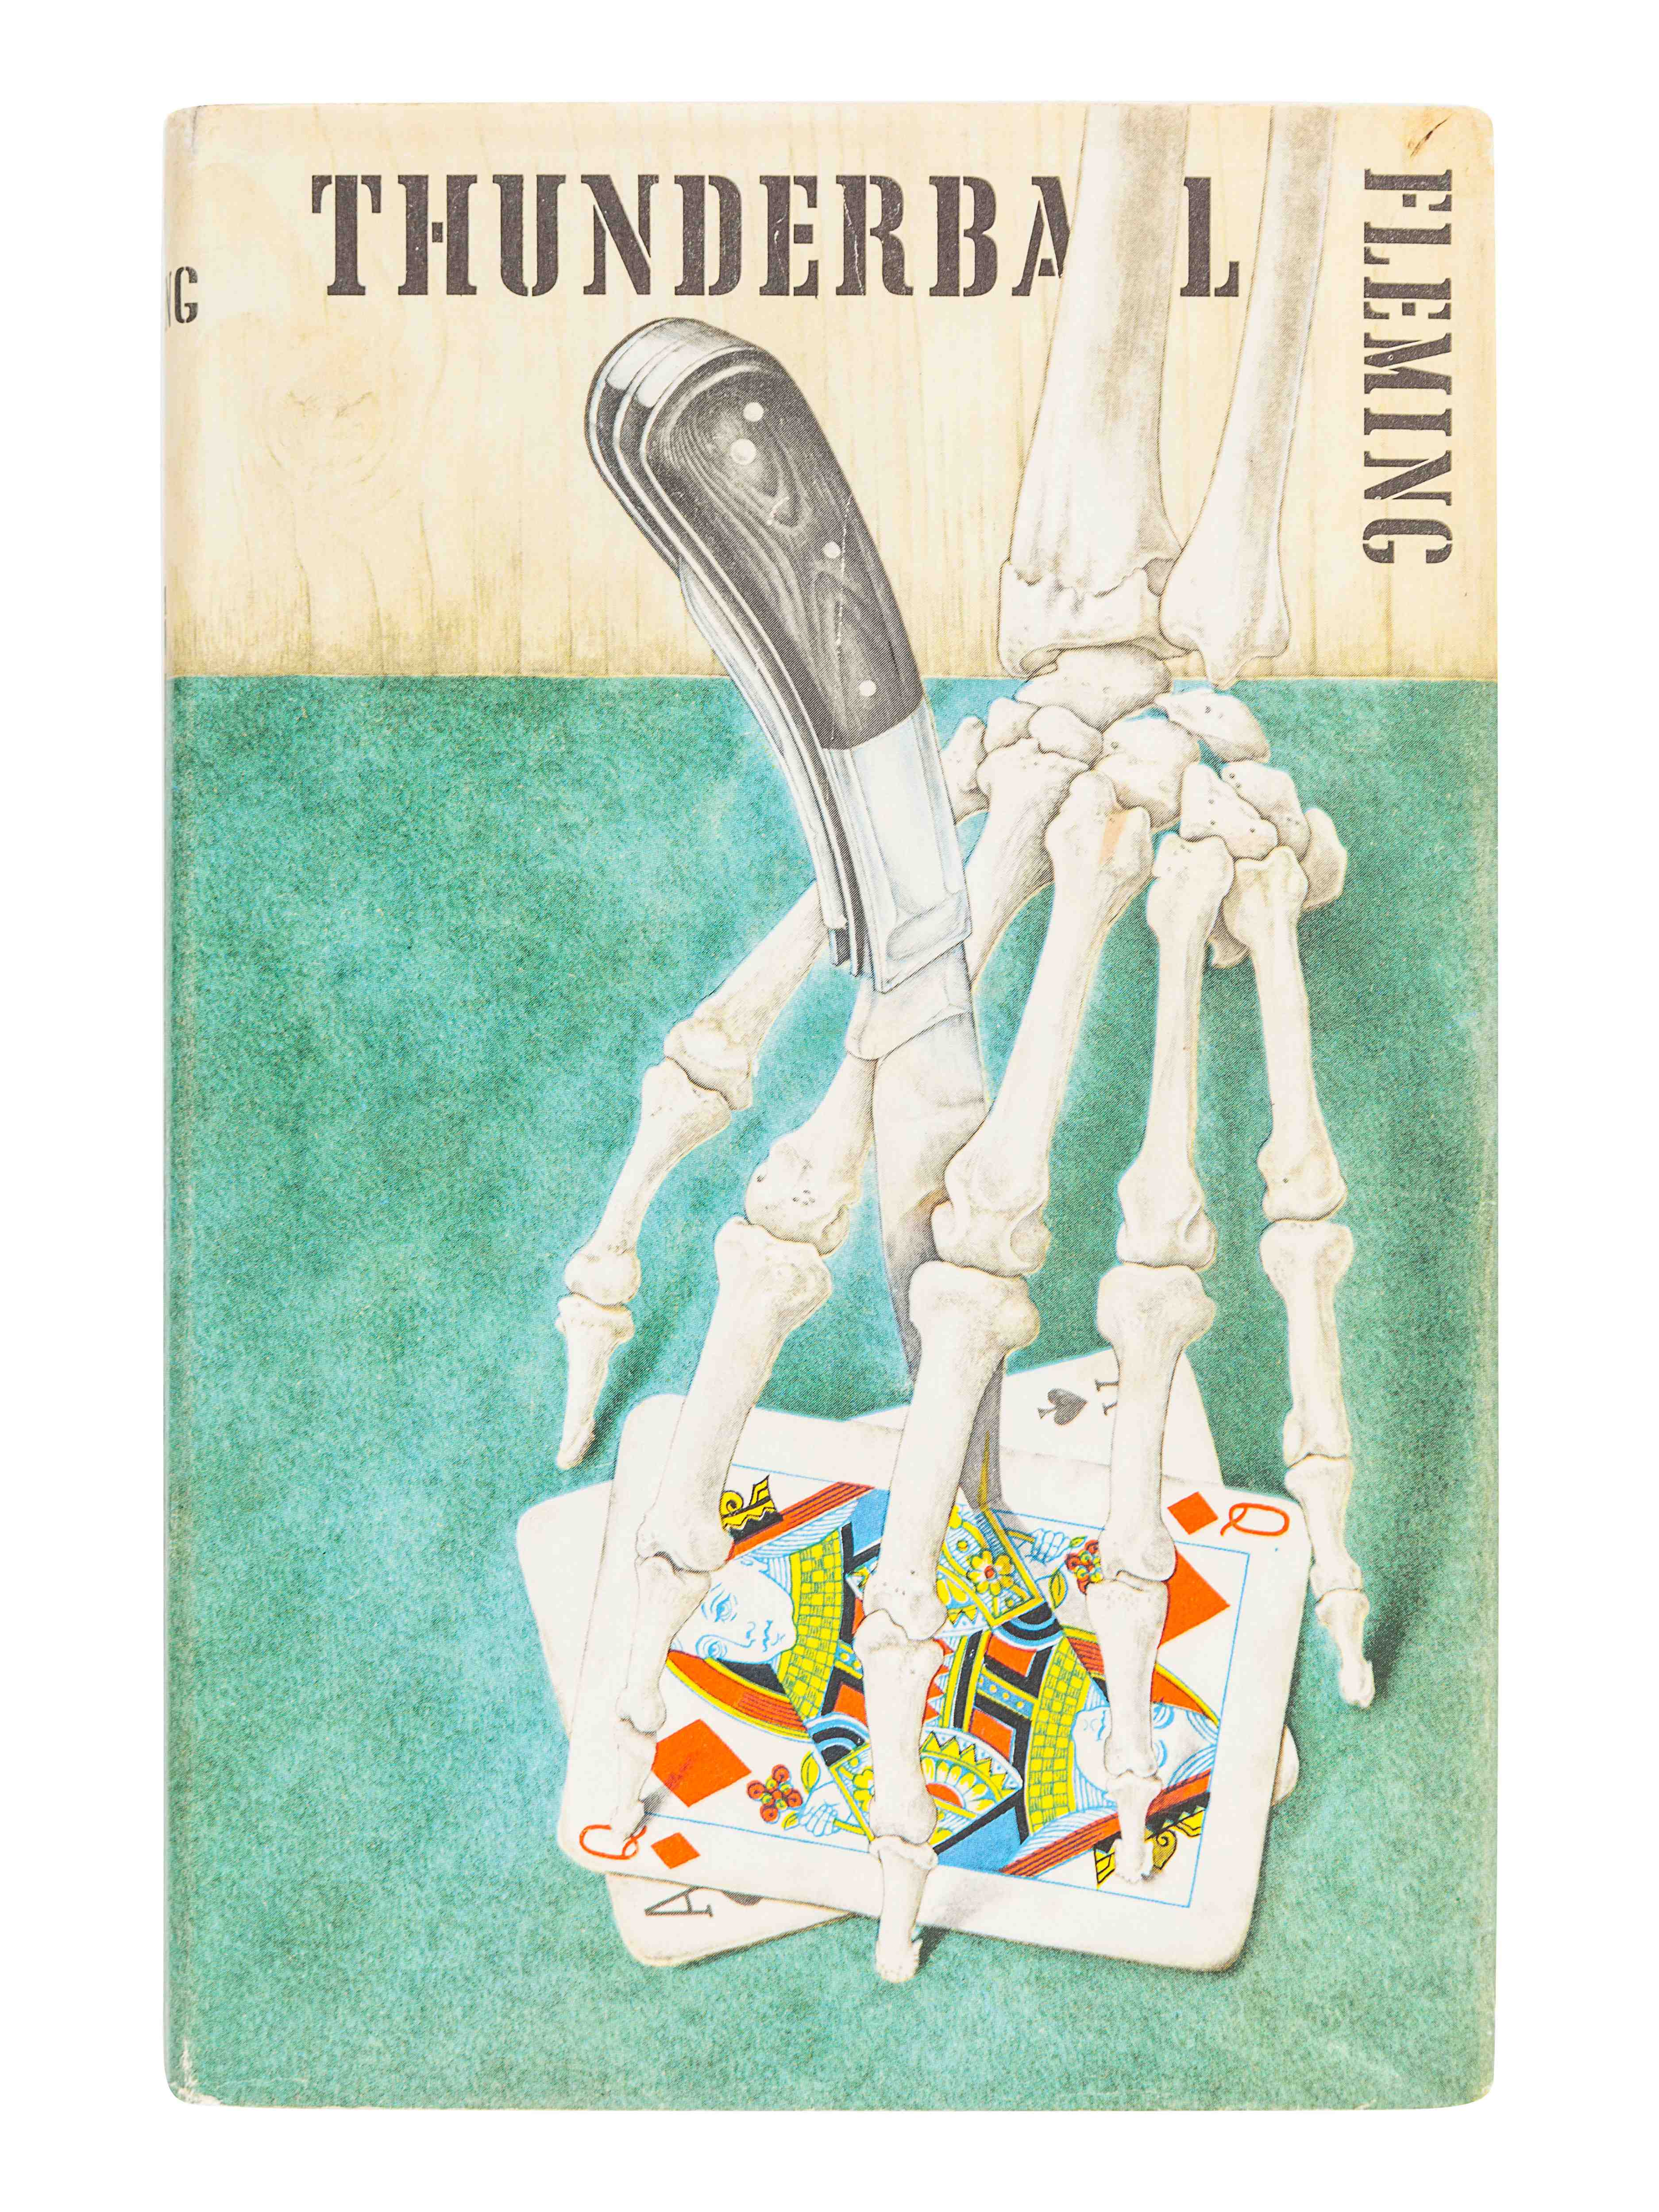 FLEMING, Ian (1908-1964). Thunderball. London: Jonathan Cape, 1961.